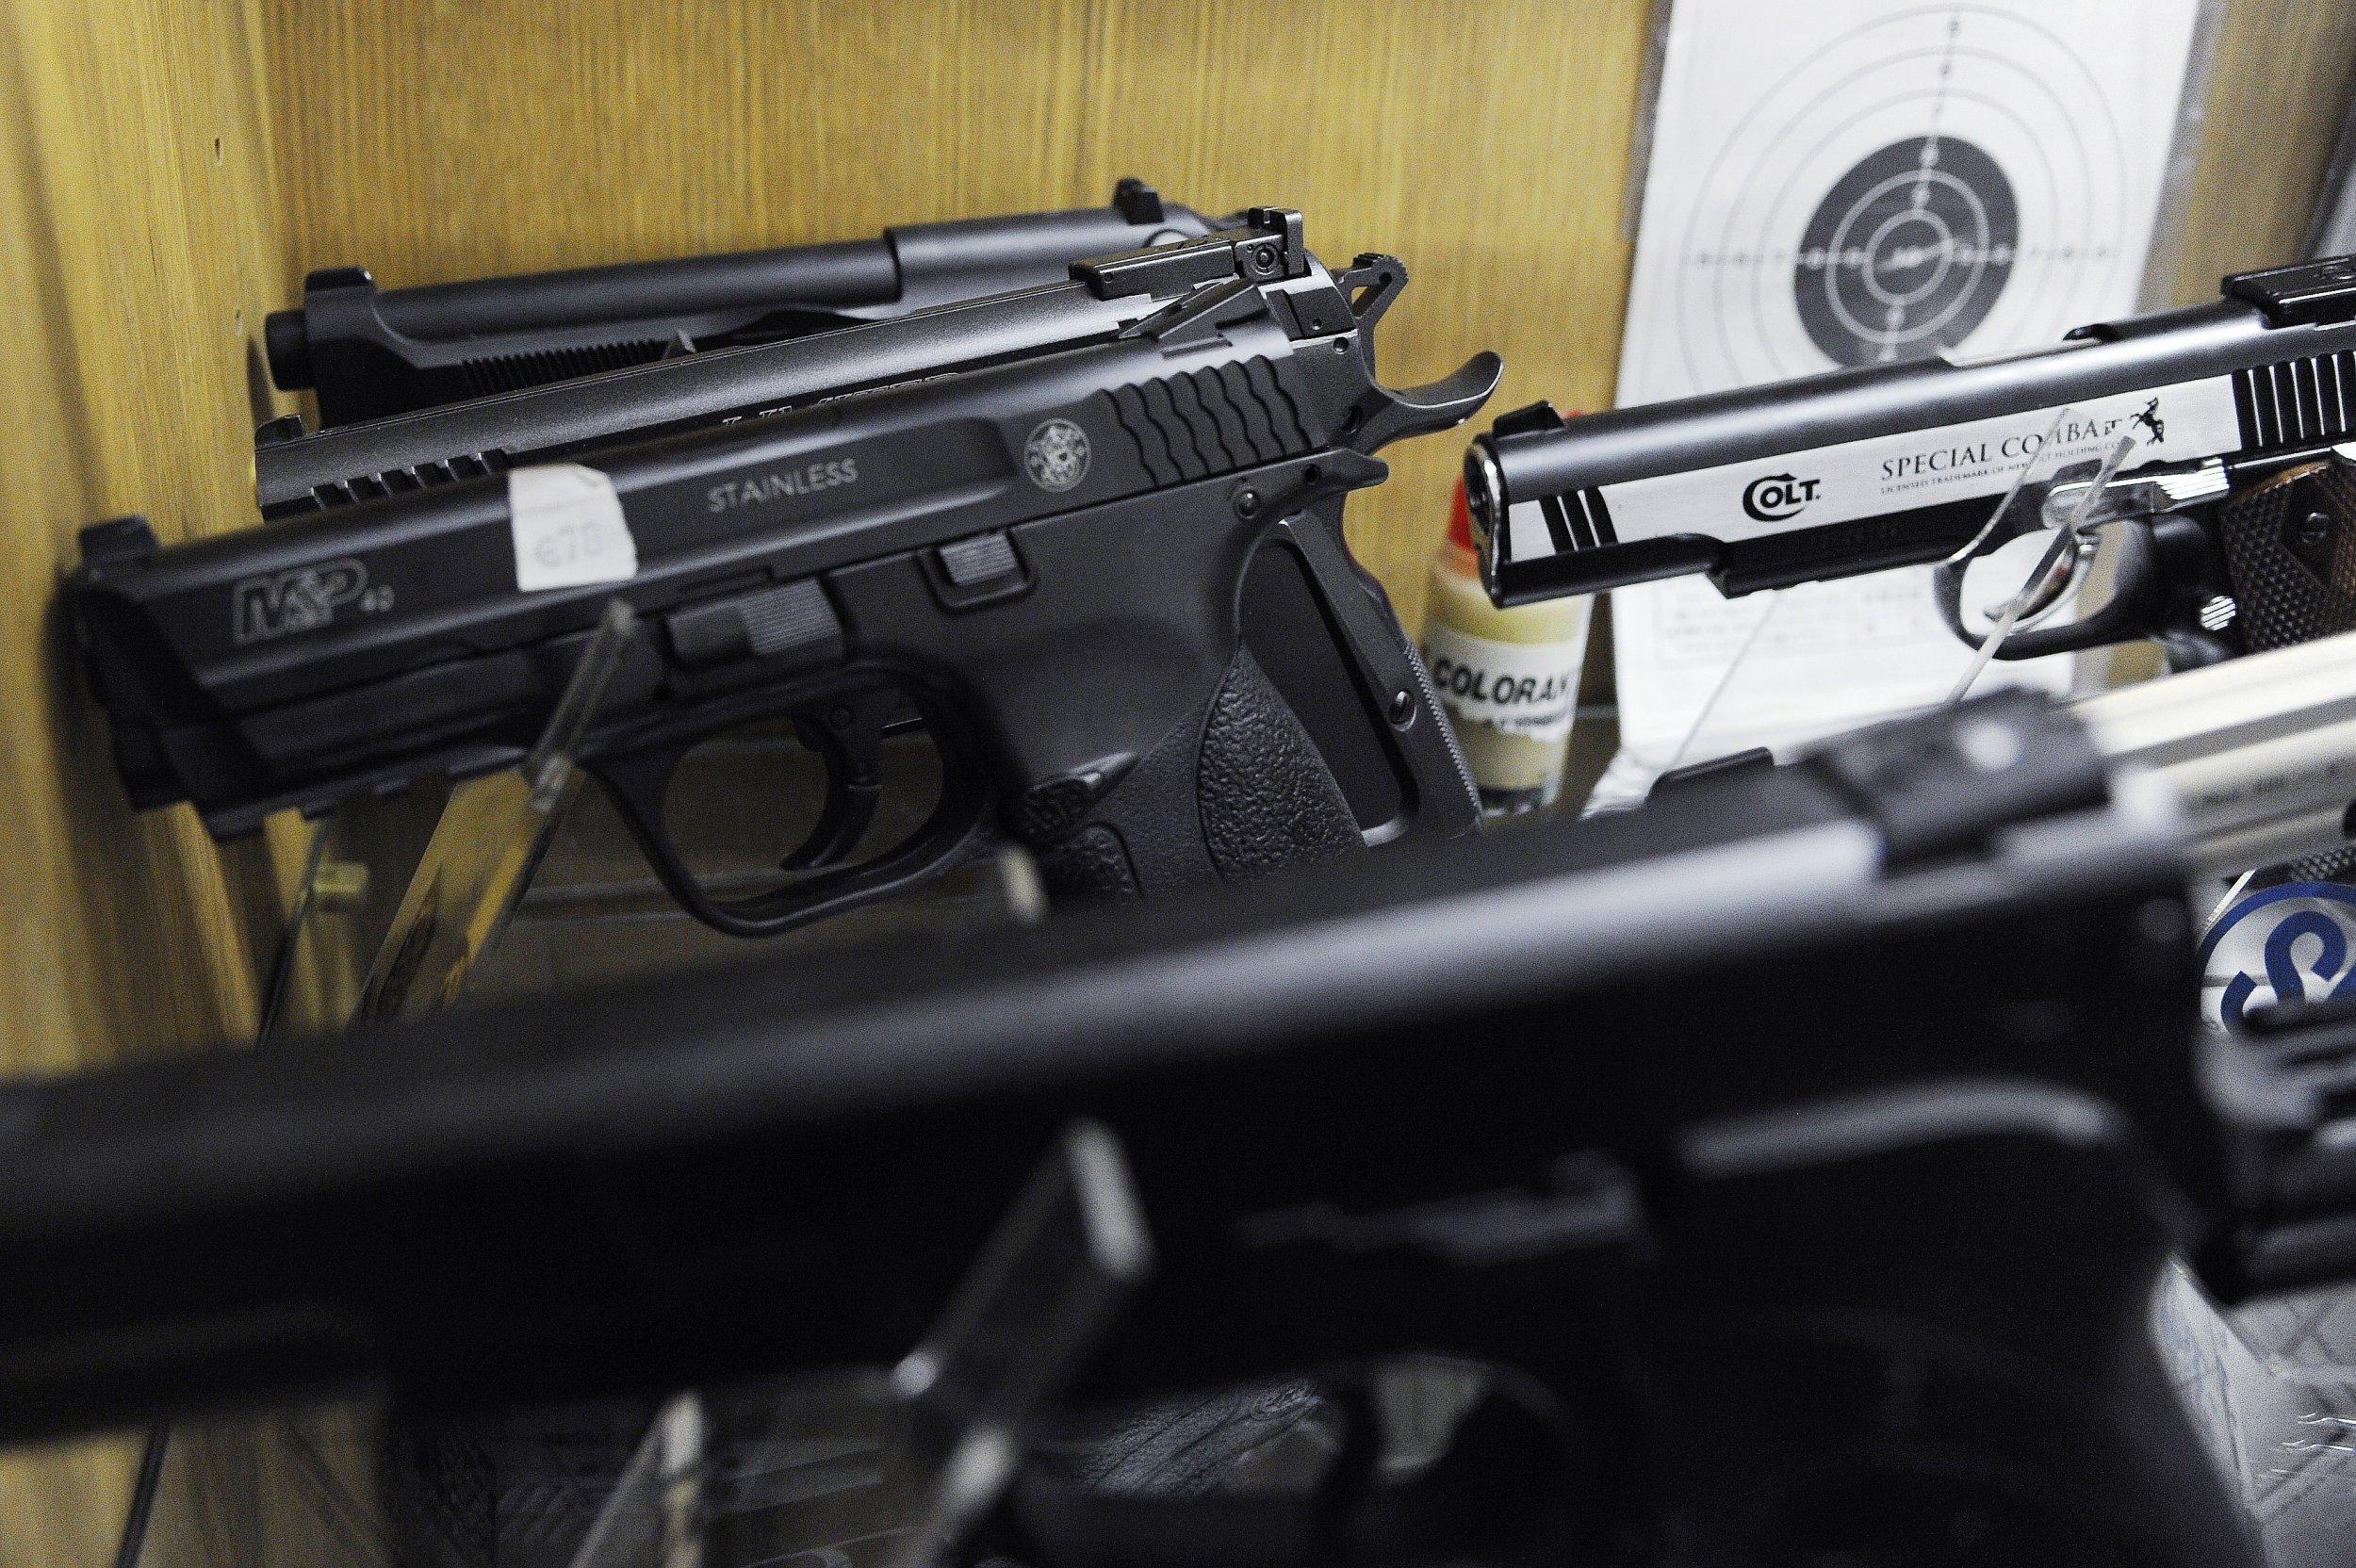 Man Brandishing Very Realistic Airsoft Gun Shot Killed By Redondo Air Soft Beach California Police